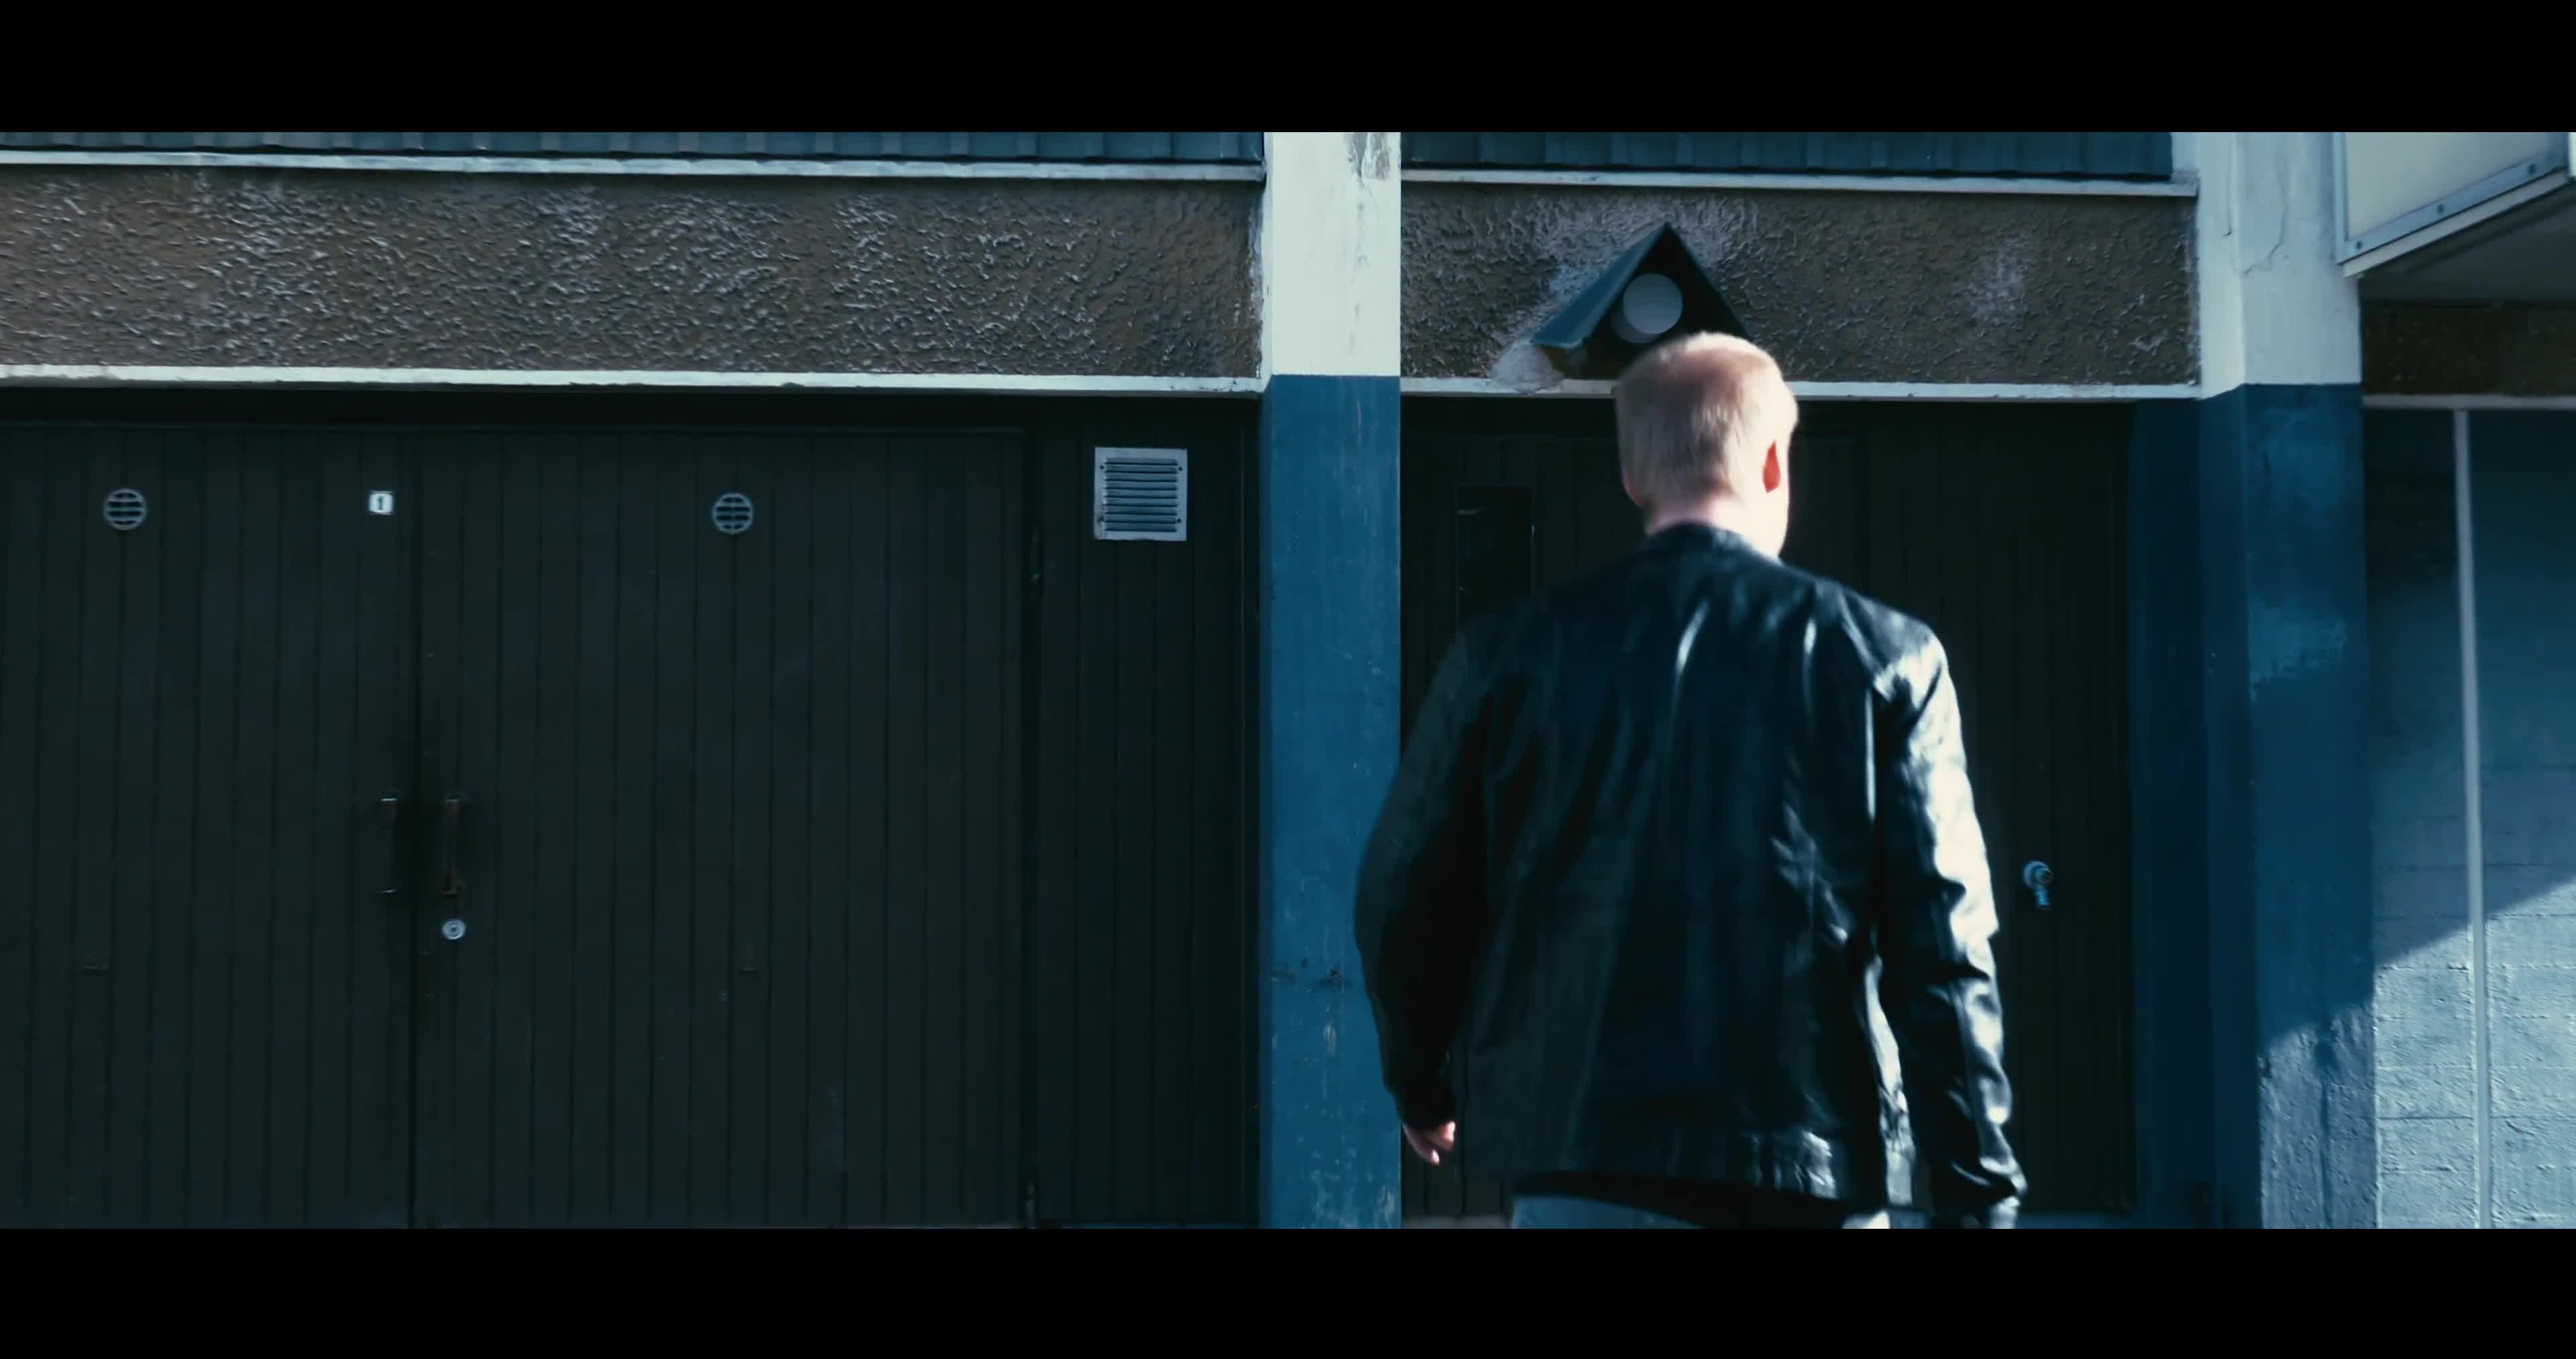 Filmmakers, gifs, bad bundle2 GIFs